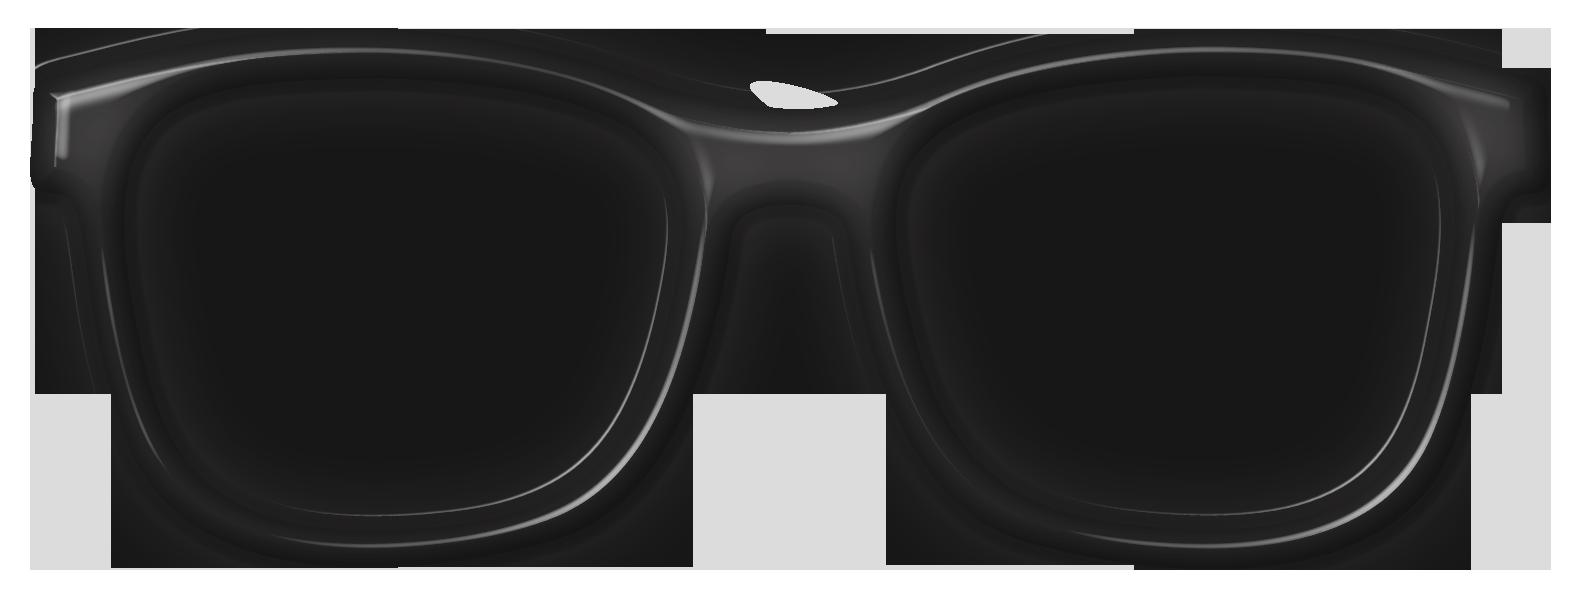 Glasses Clipart Image.